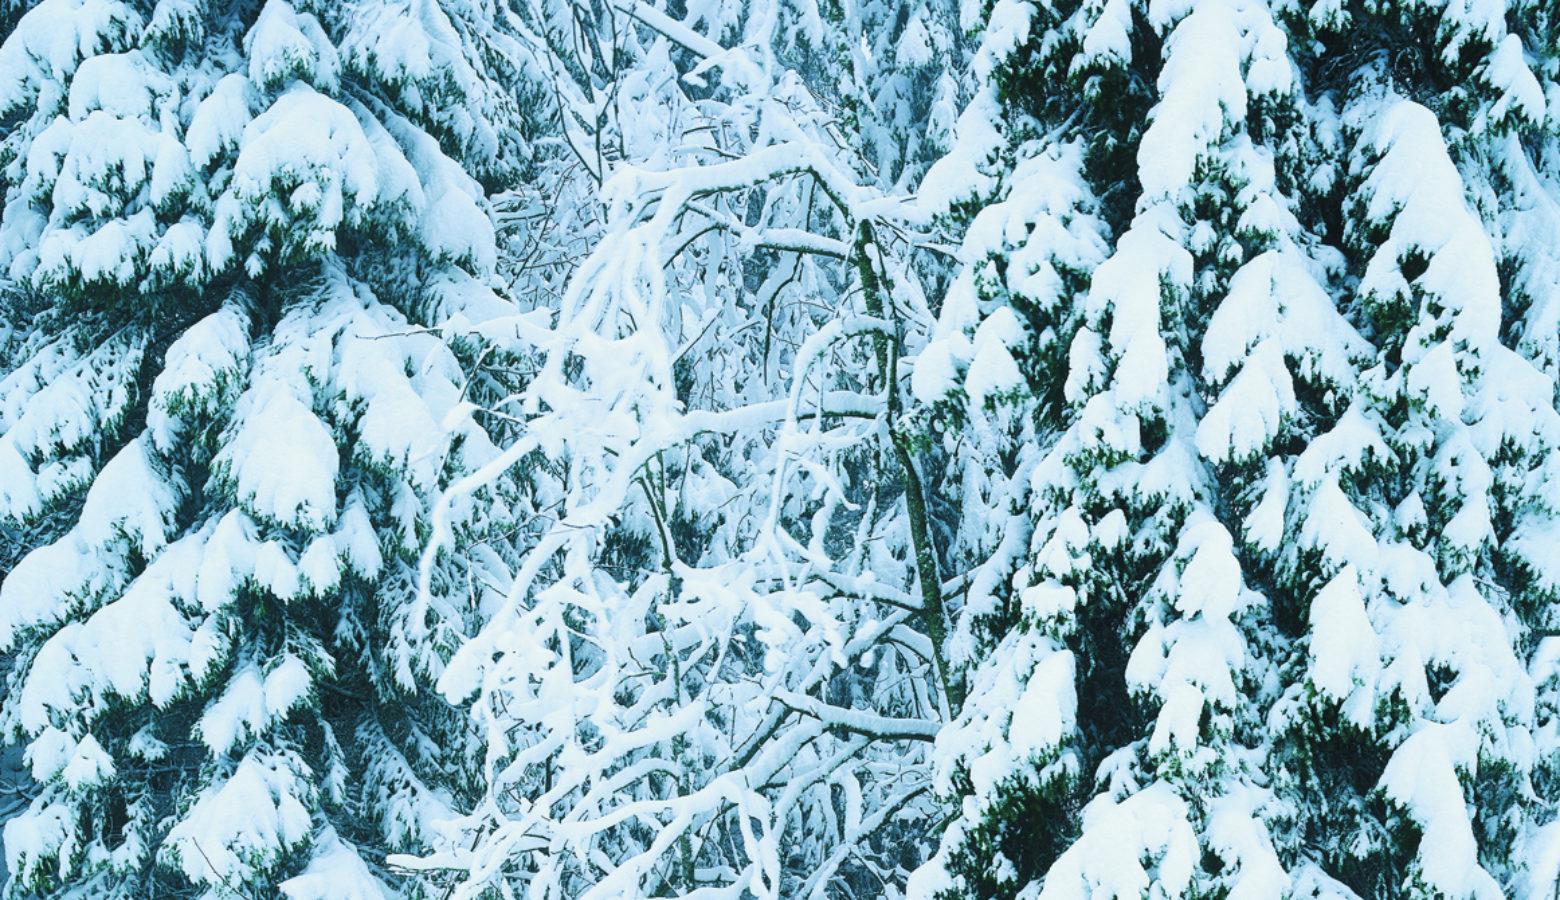 Snodekt Skog Foto Morten Brun